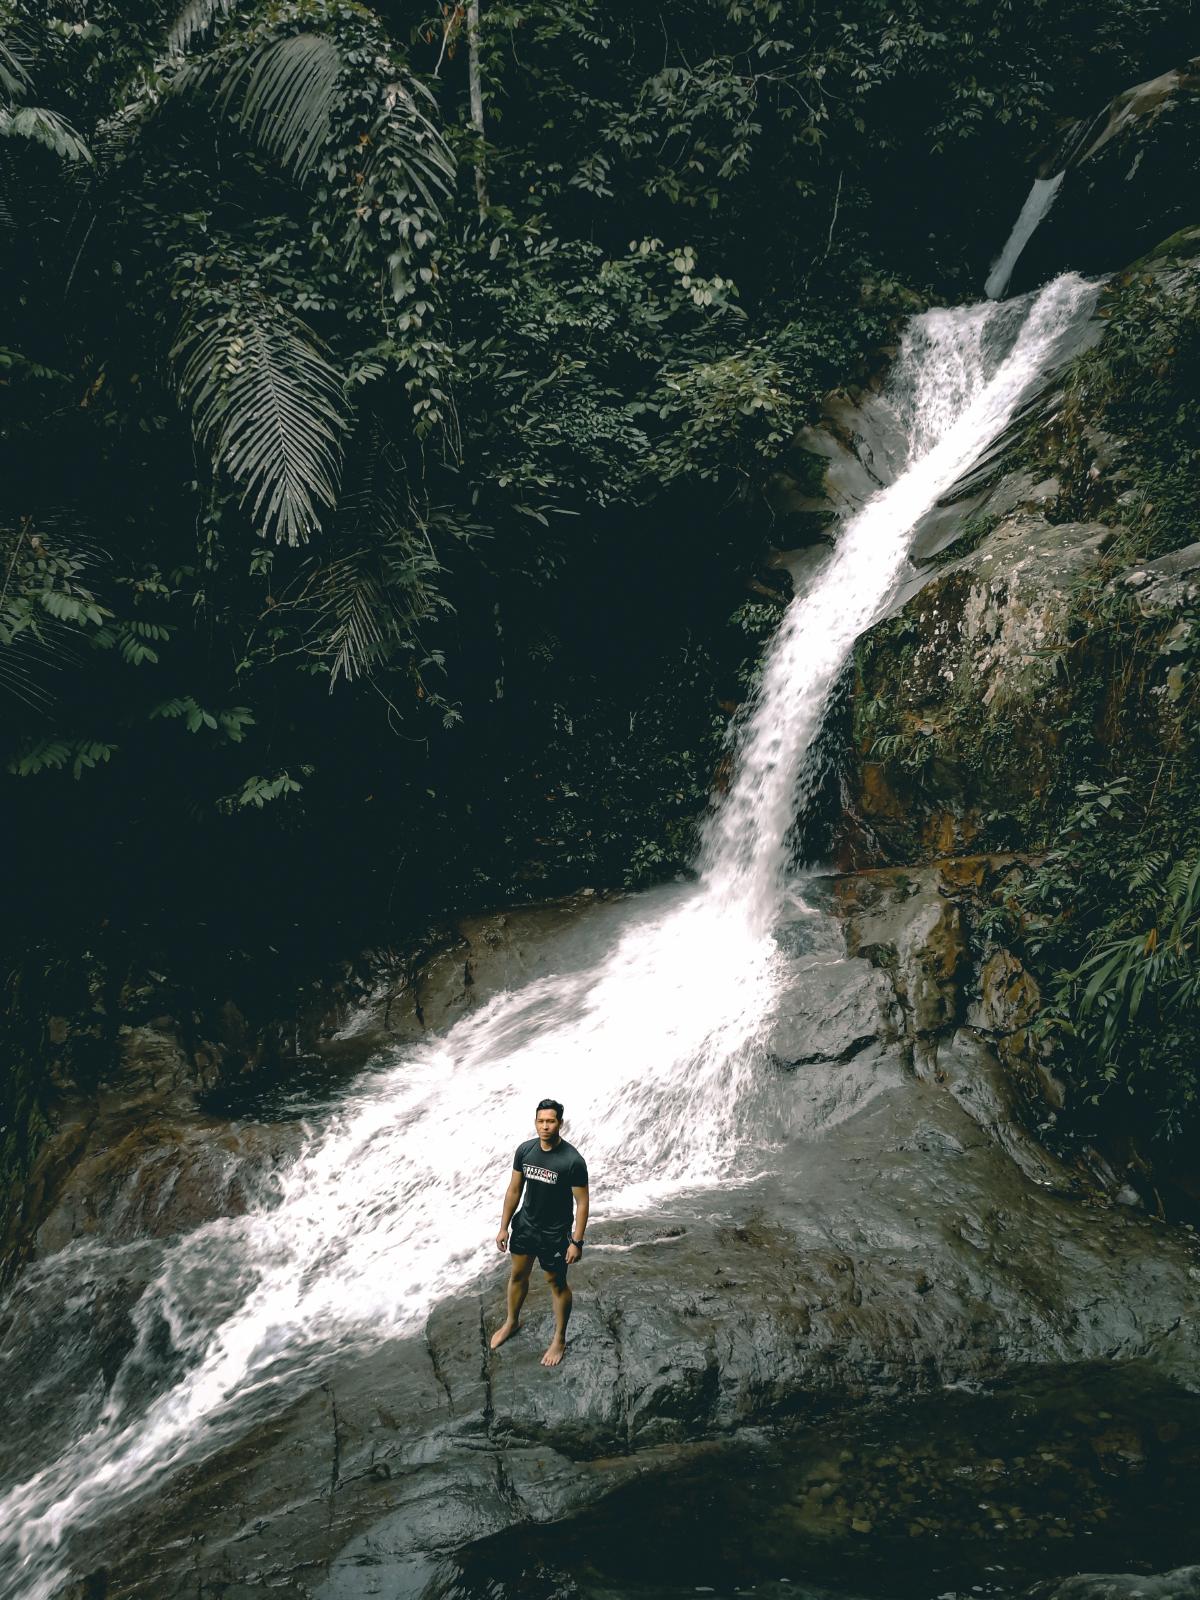 AIR Terjun Sungai Lopo yang menarik kehadiran pencinta alam semula jadi.